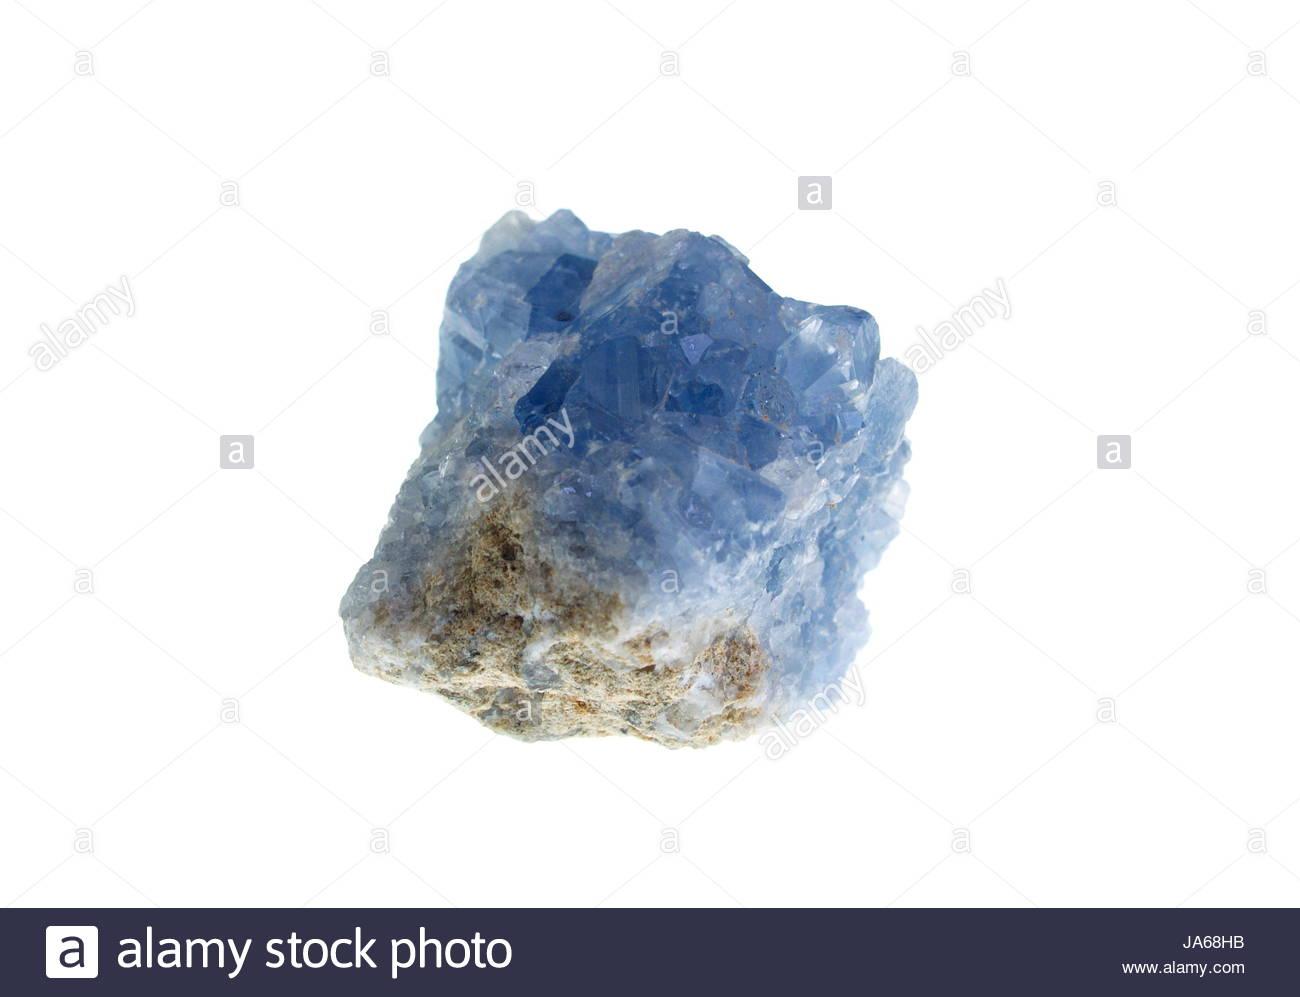 Celestine, precious stone on white background, studio isolated photo. - Stock Image